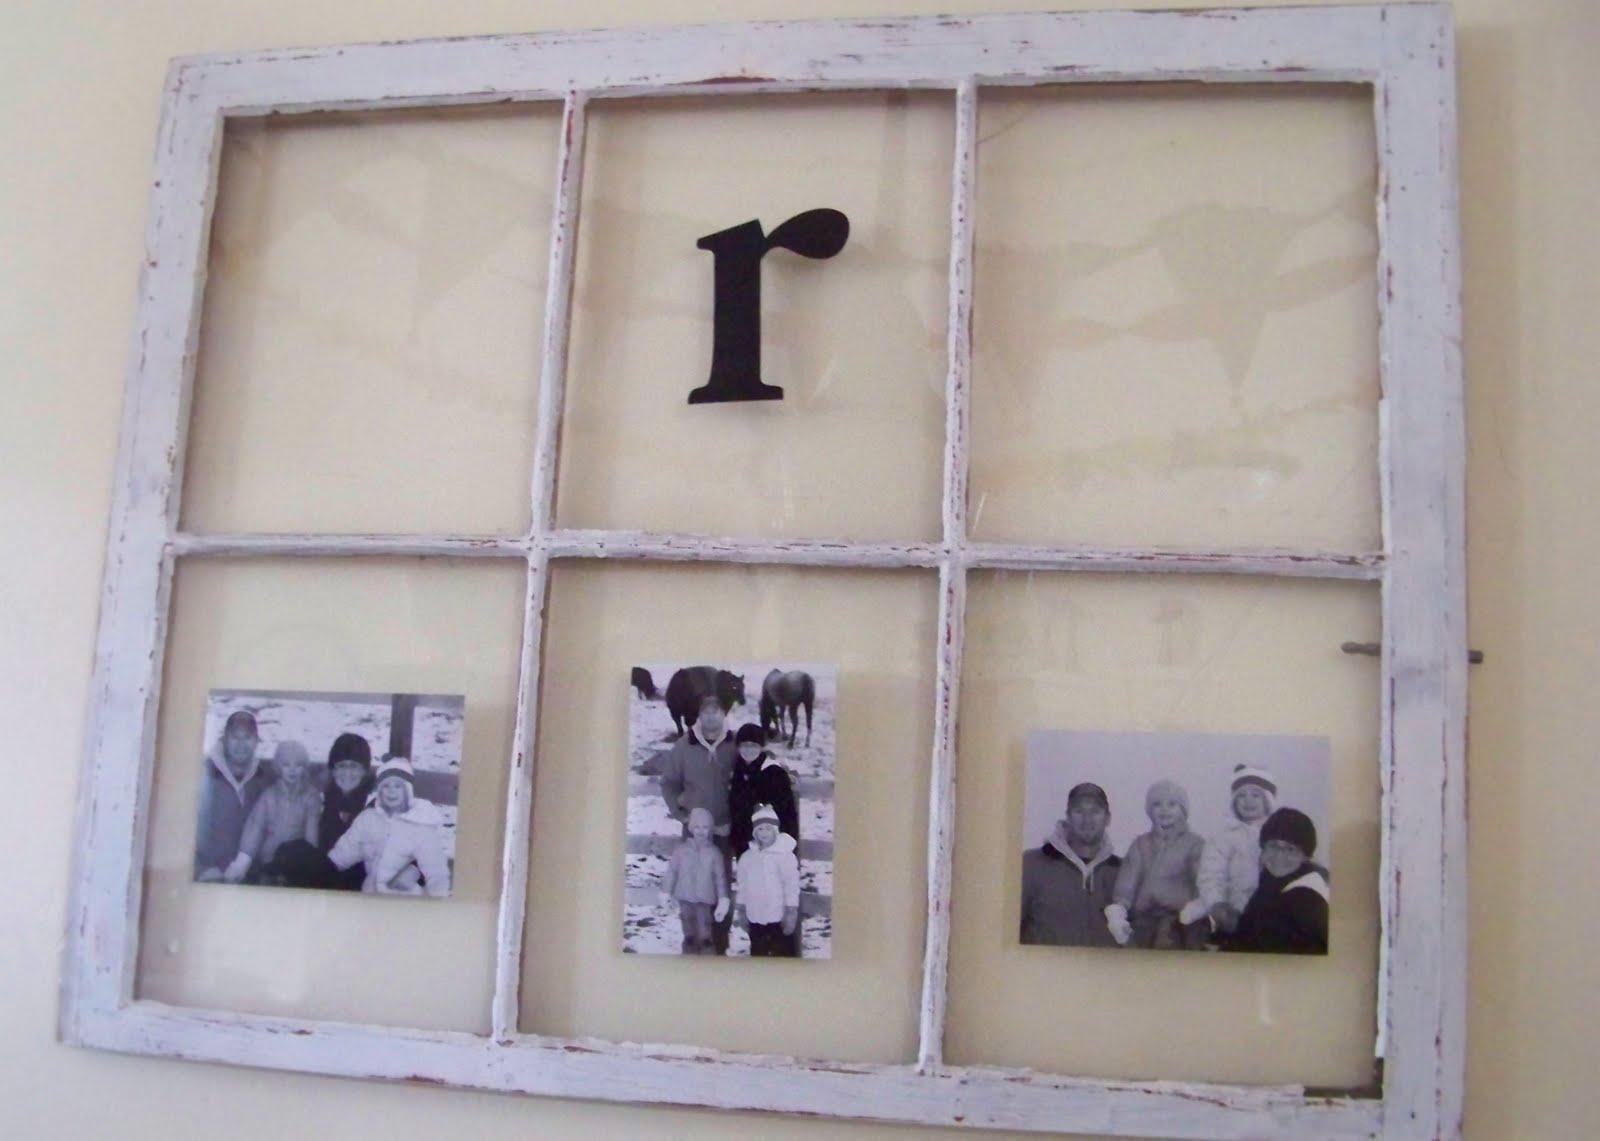 using old window frames to decorate shejami - Window Frame Decor